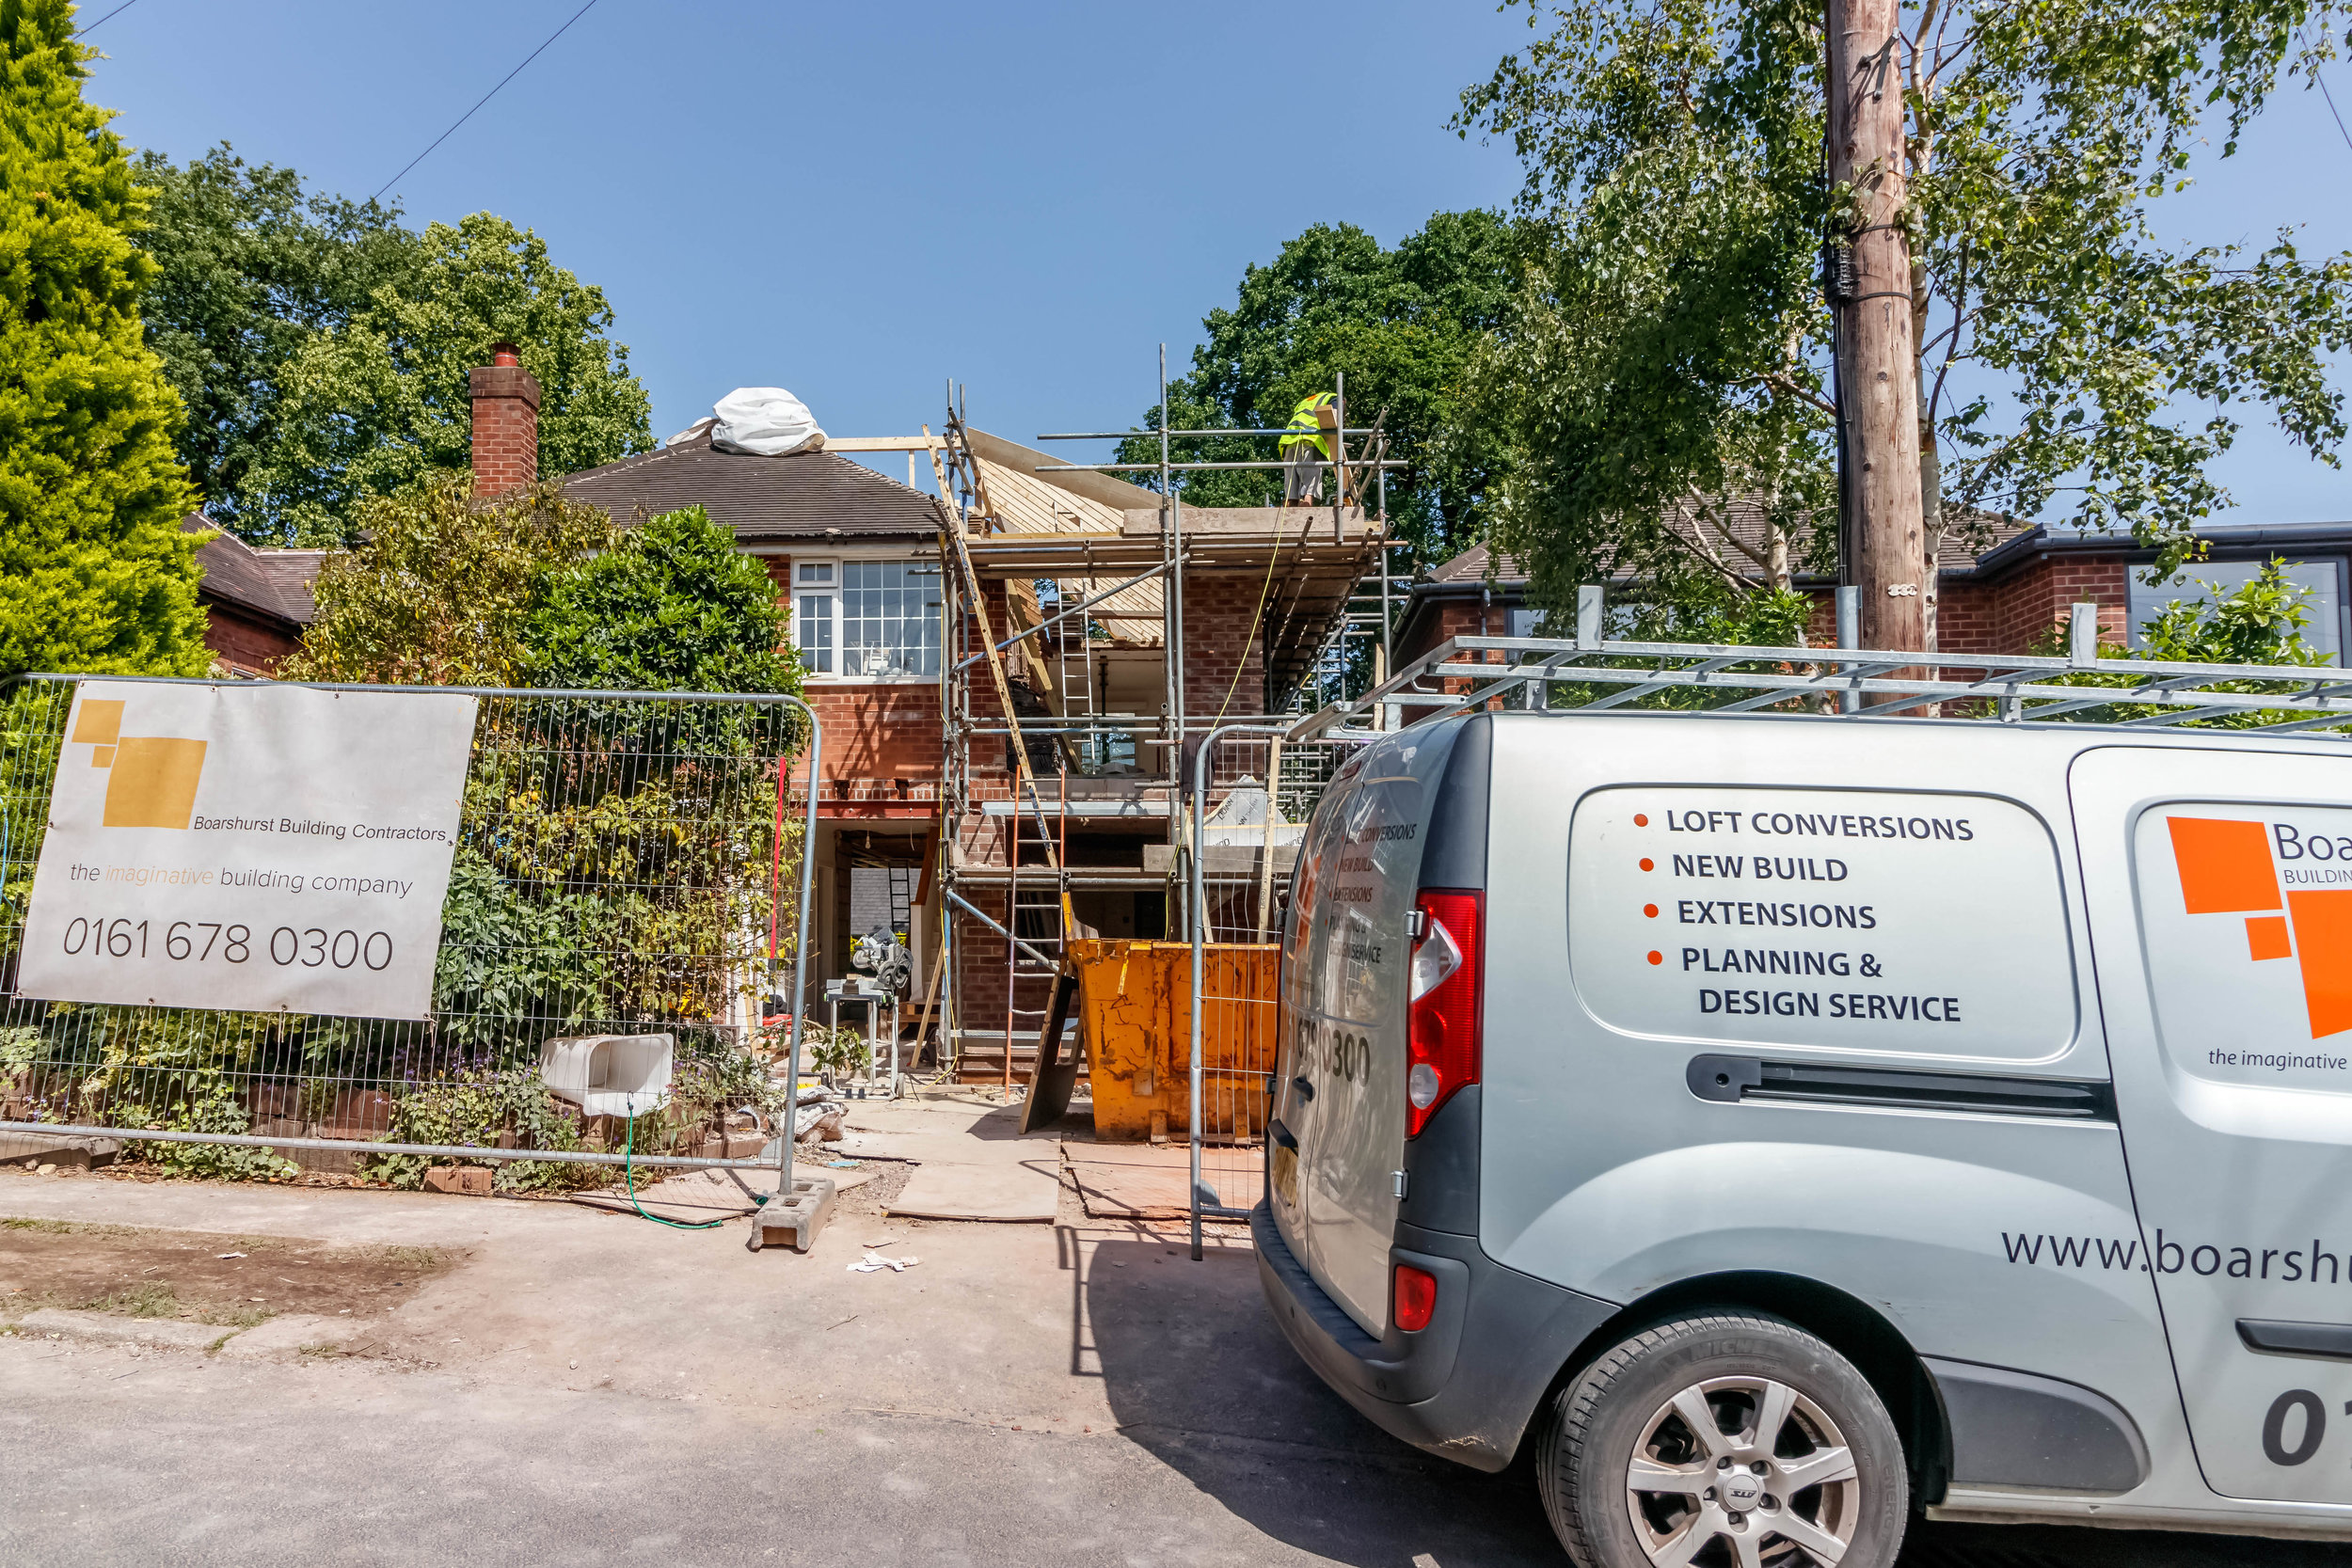 PropertyPhotographs-05173.jpg